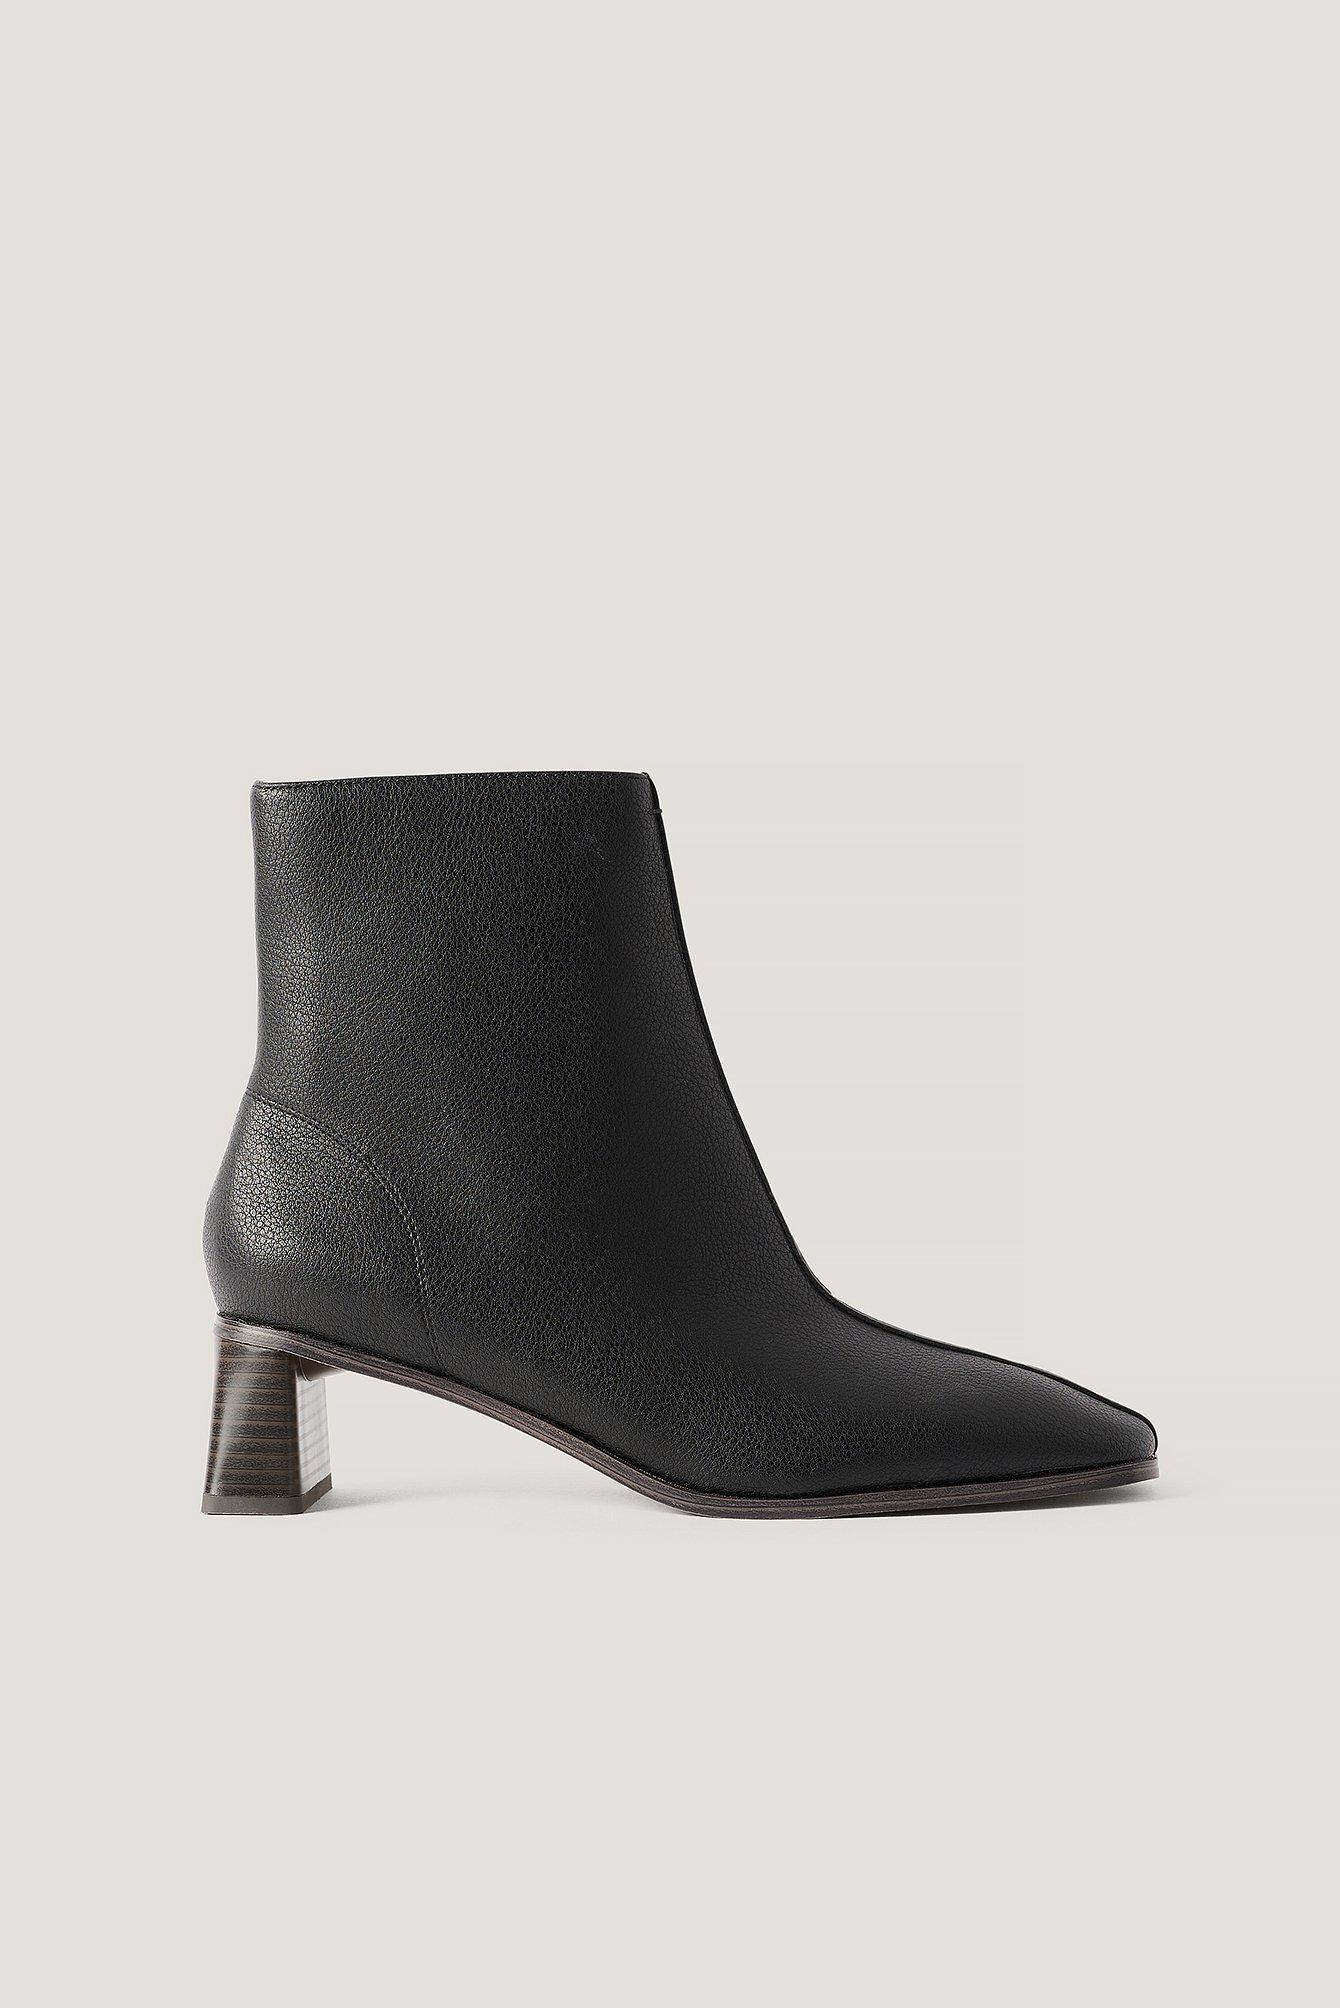 Na-Kd Shoes Zylinder Heel Squared Toe Boots - Black